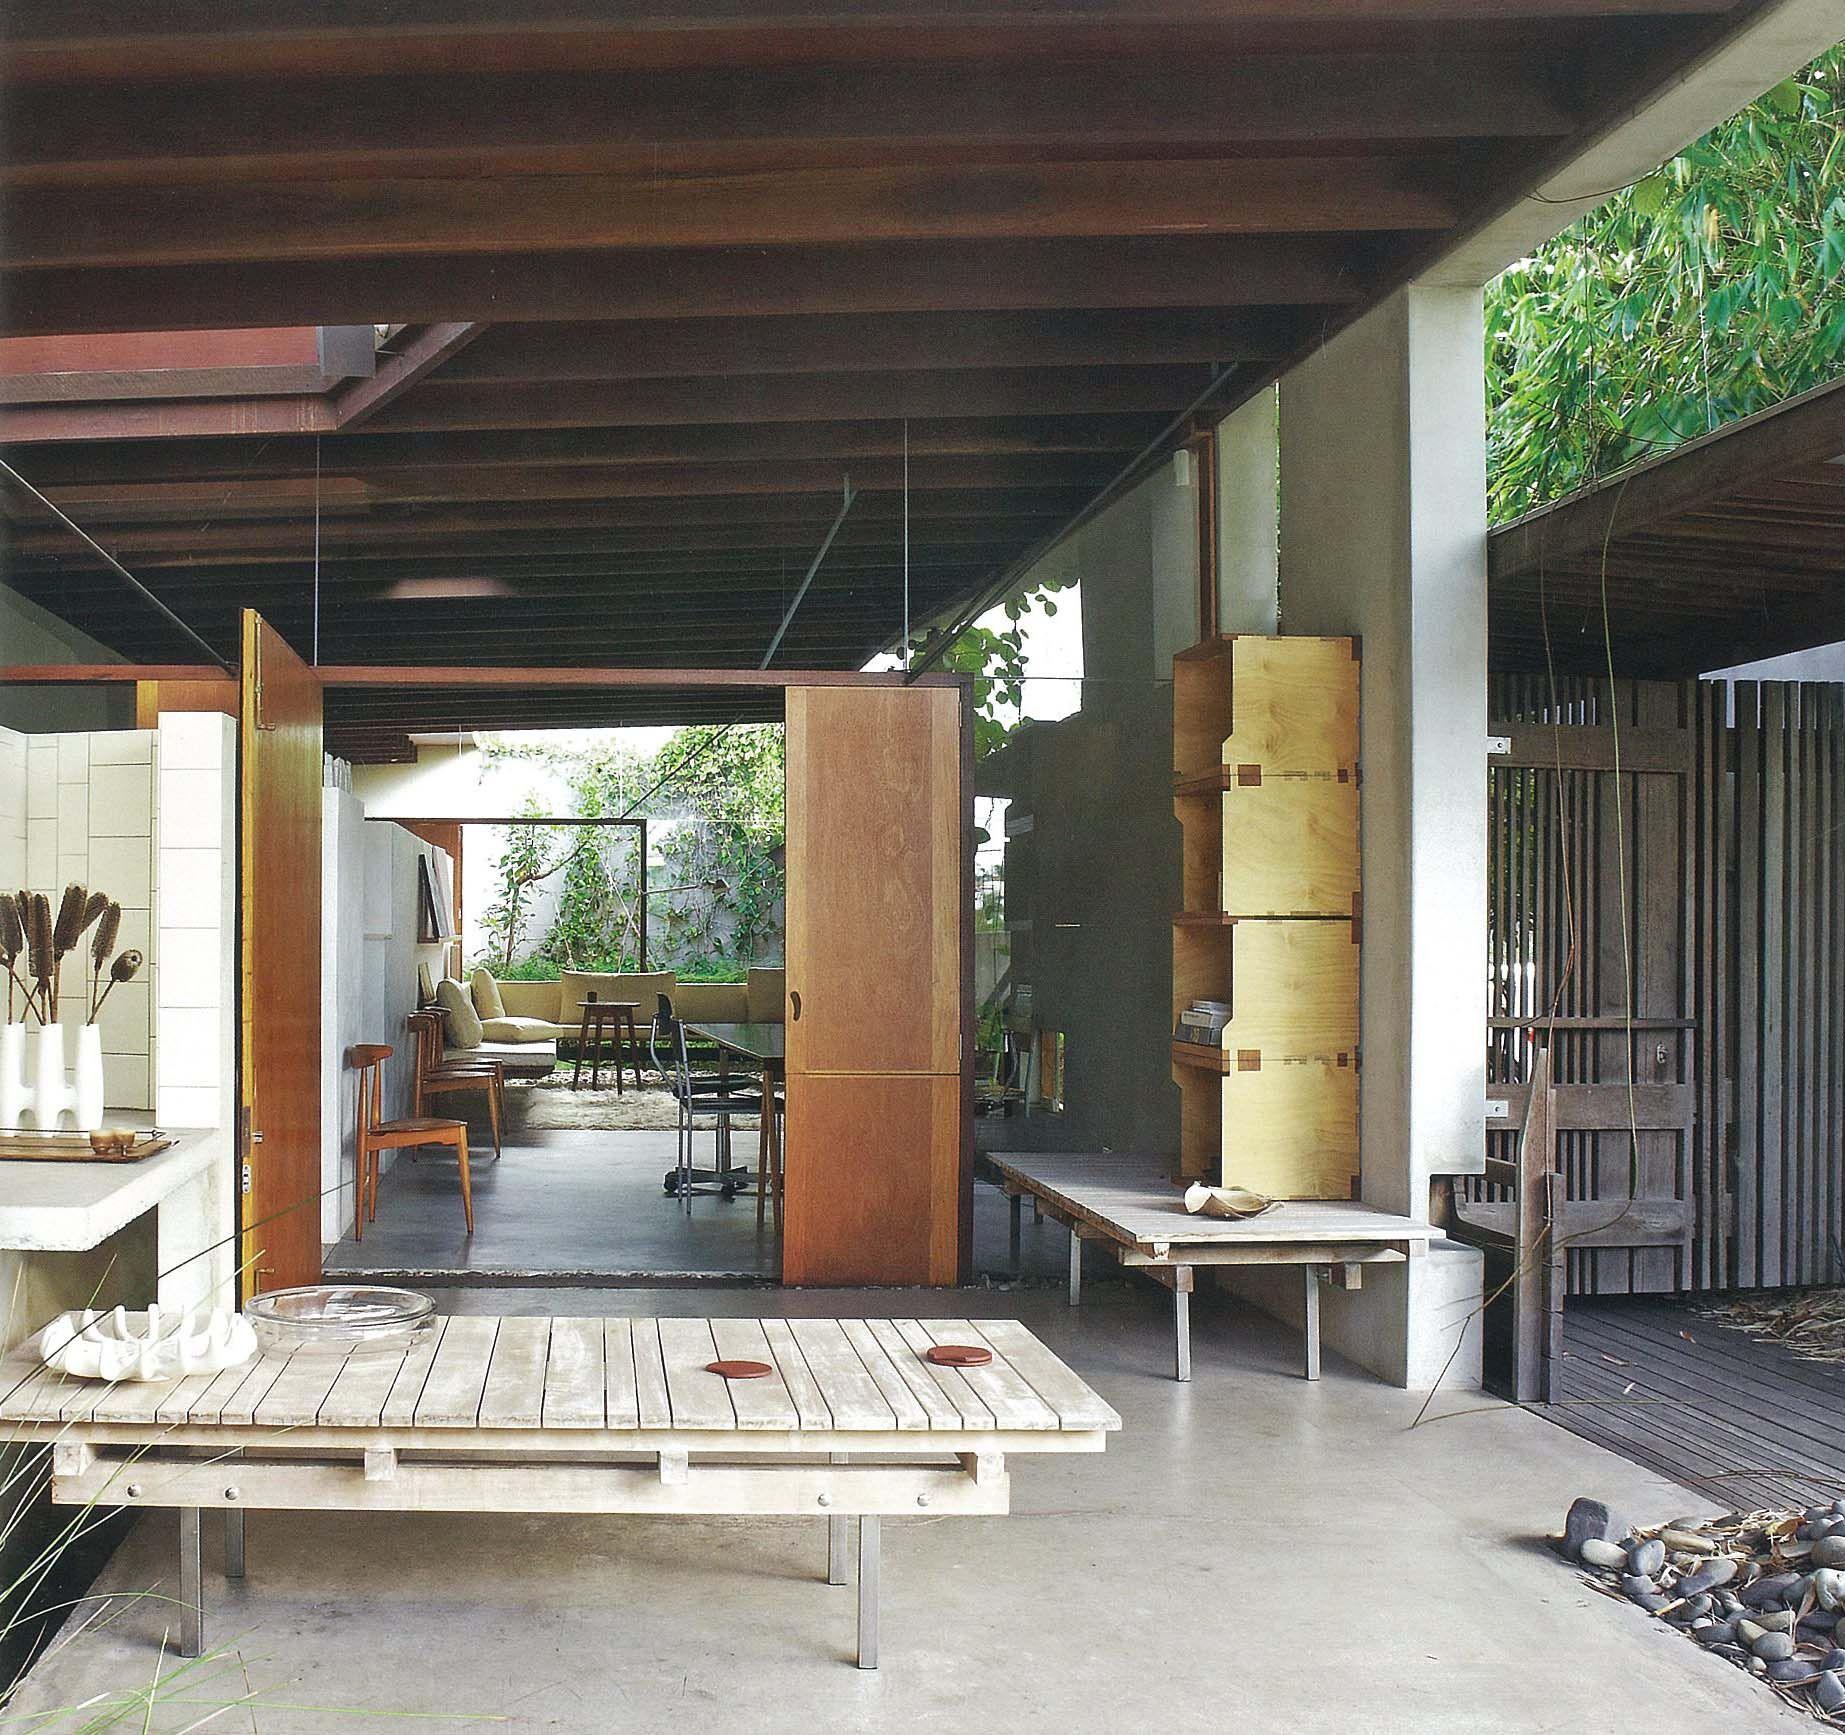 donovan hill d house | australian architecture | Pinterest ...